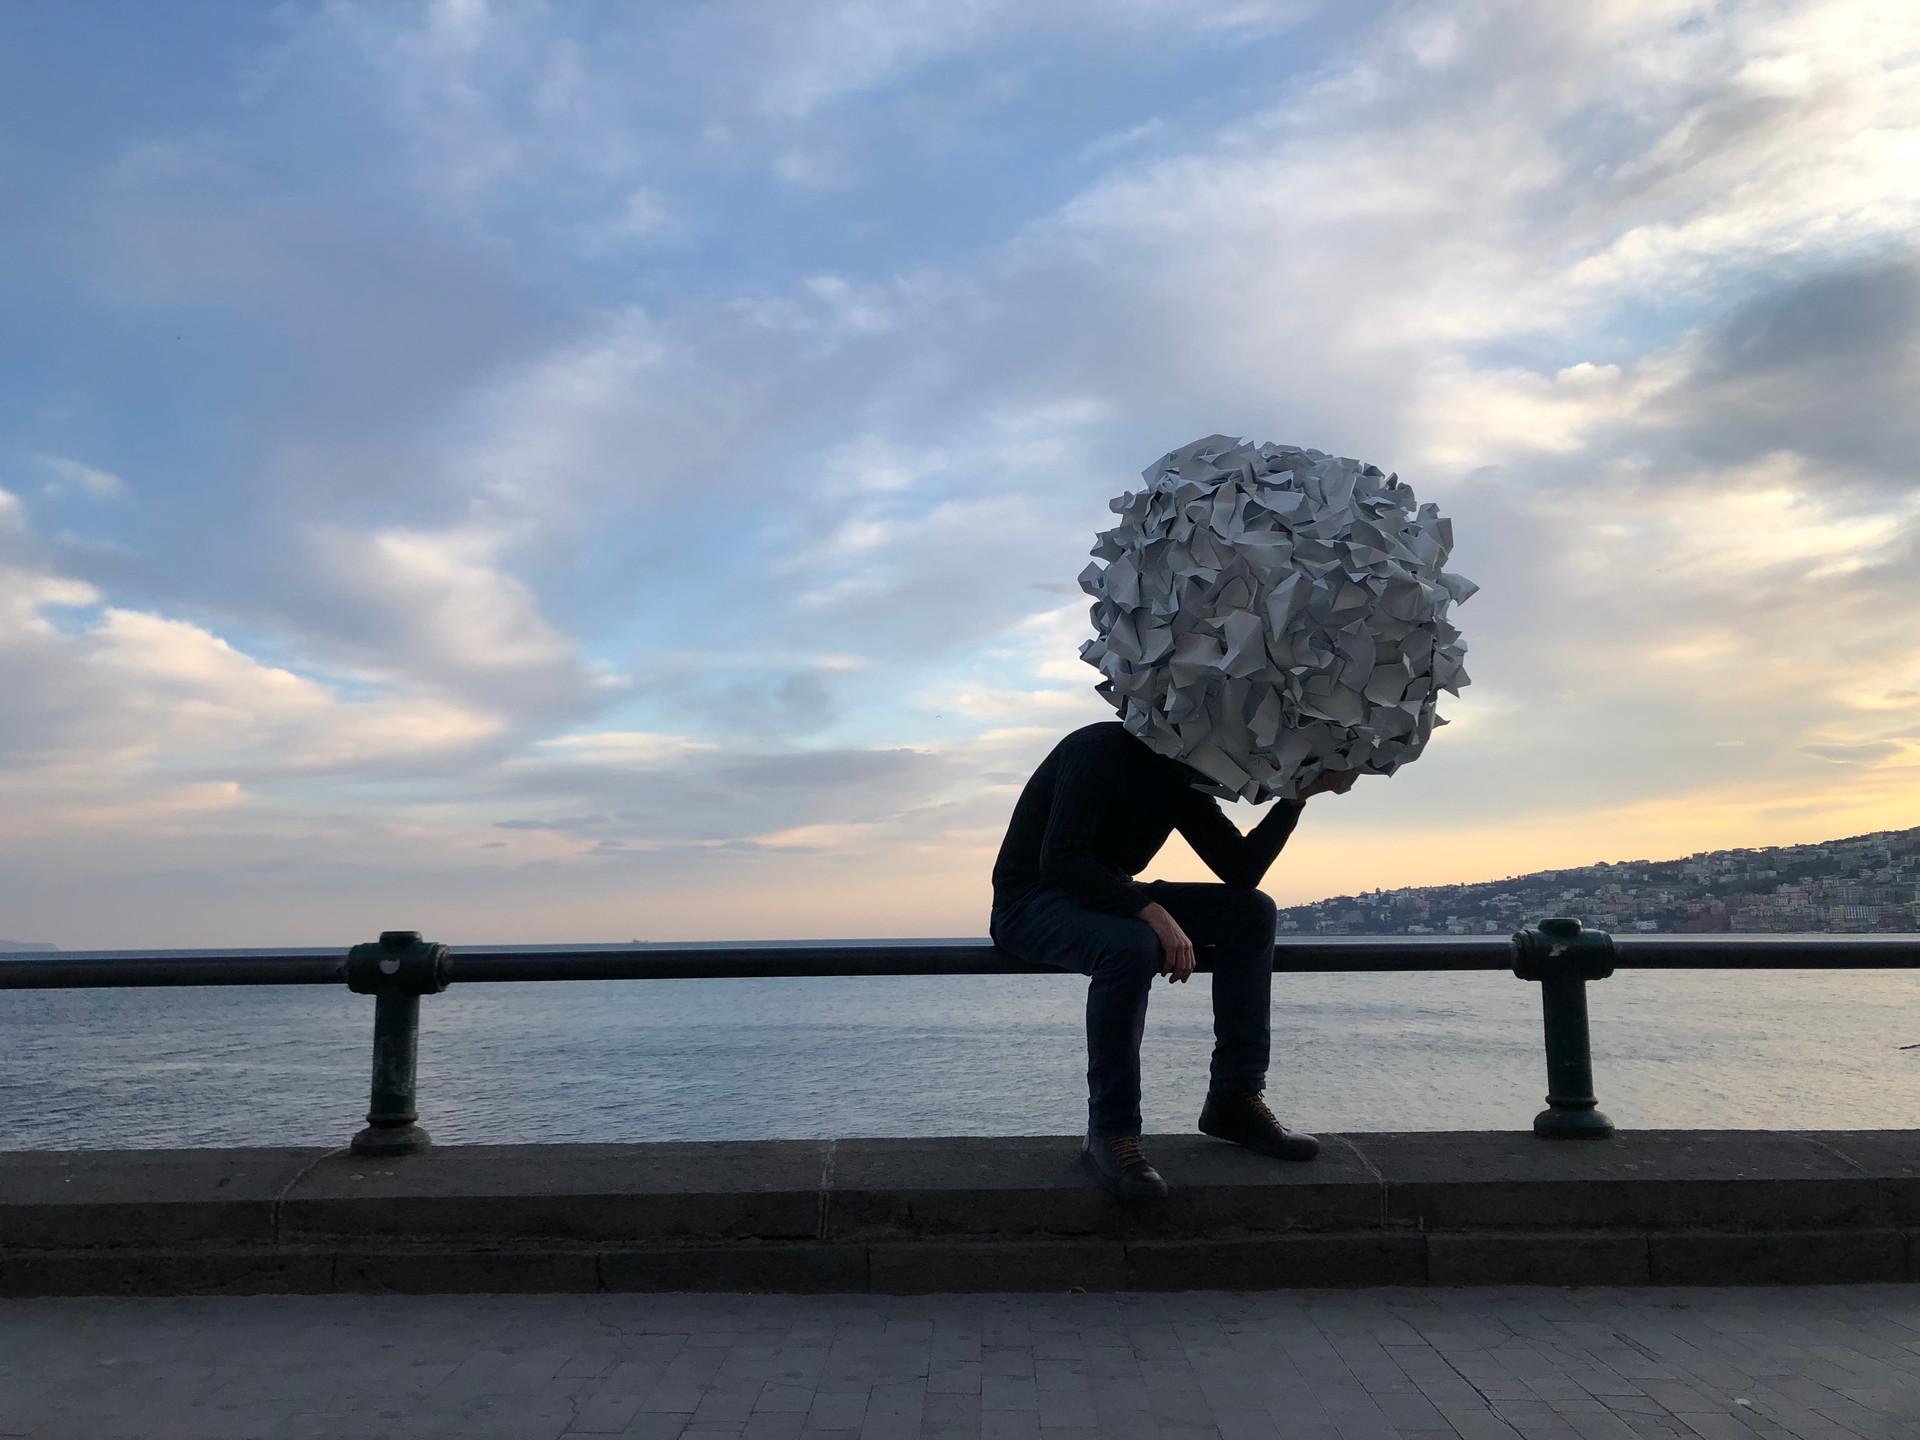 self-portrait on the promenade of Naples